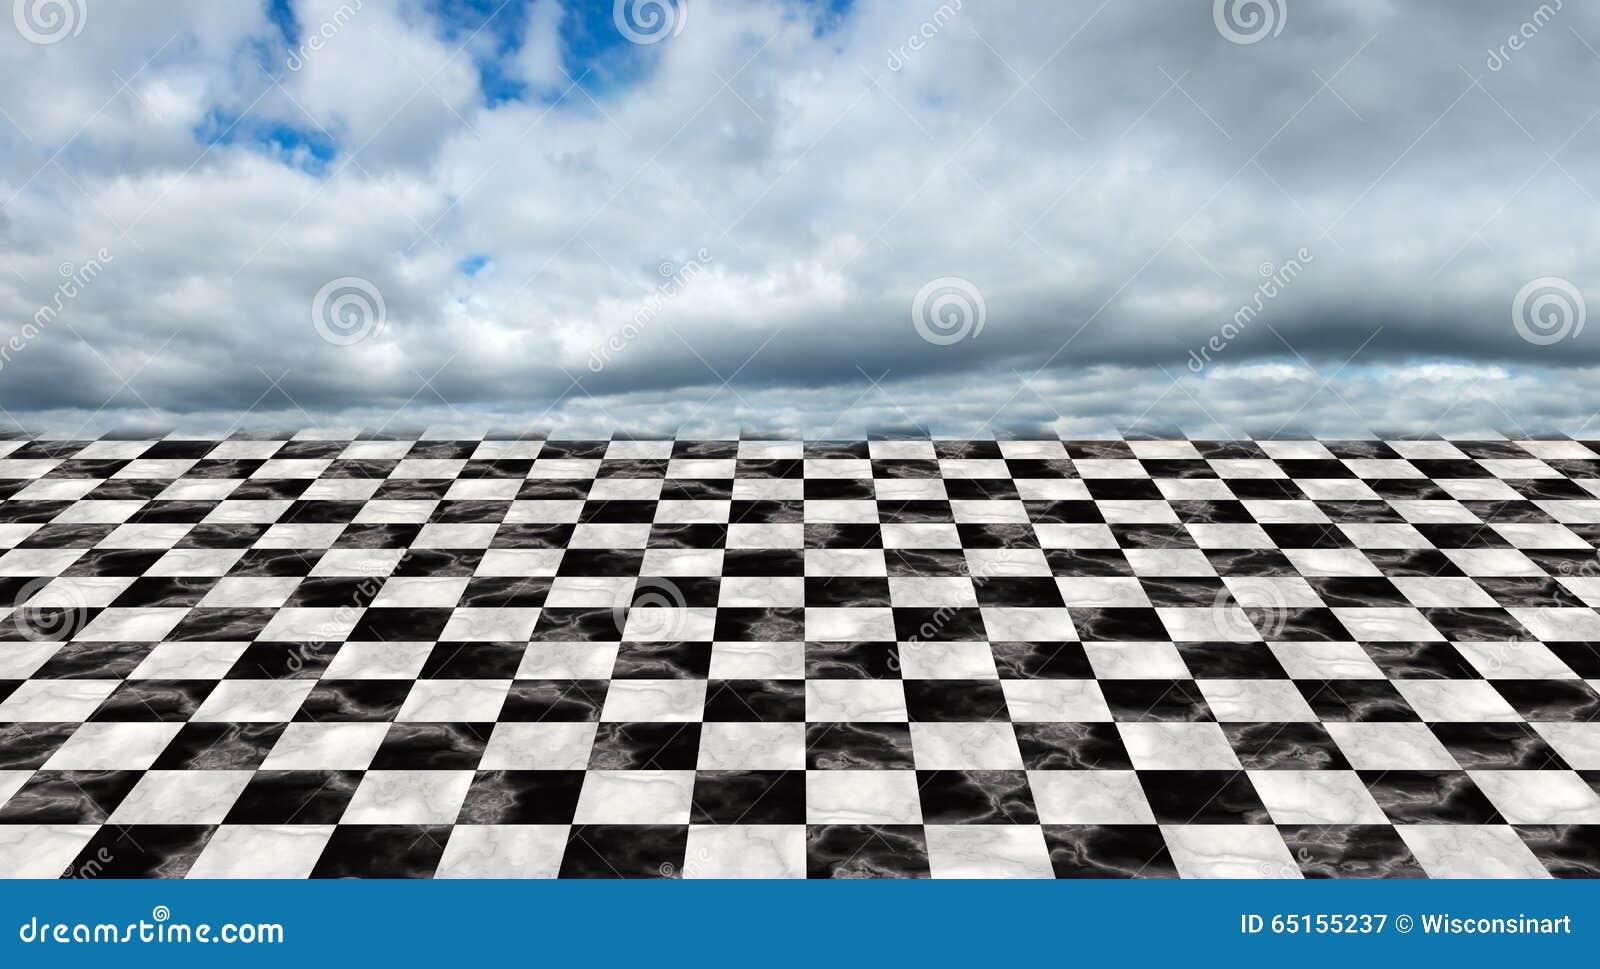 Infinite Checkerboard Floor, Clouds, Sky